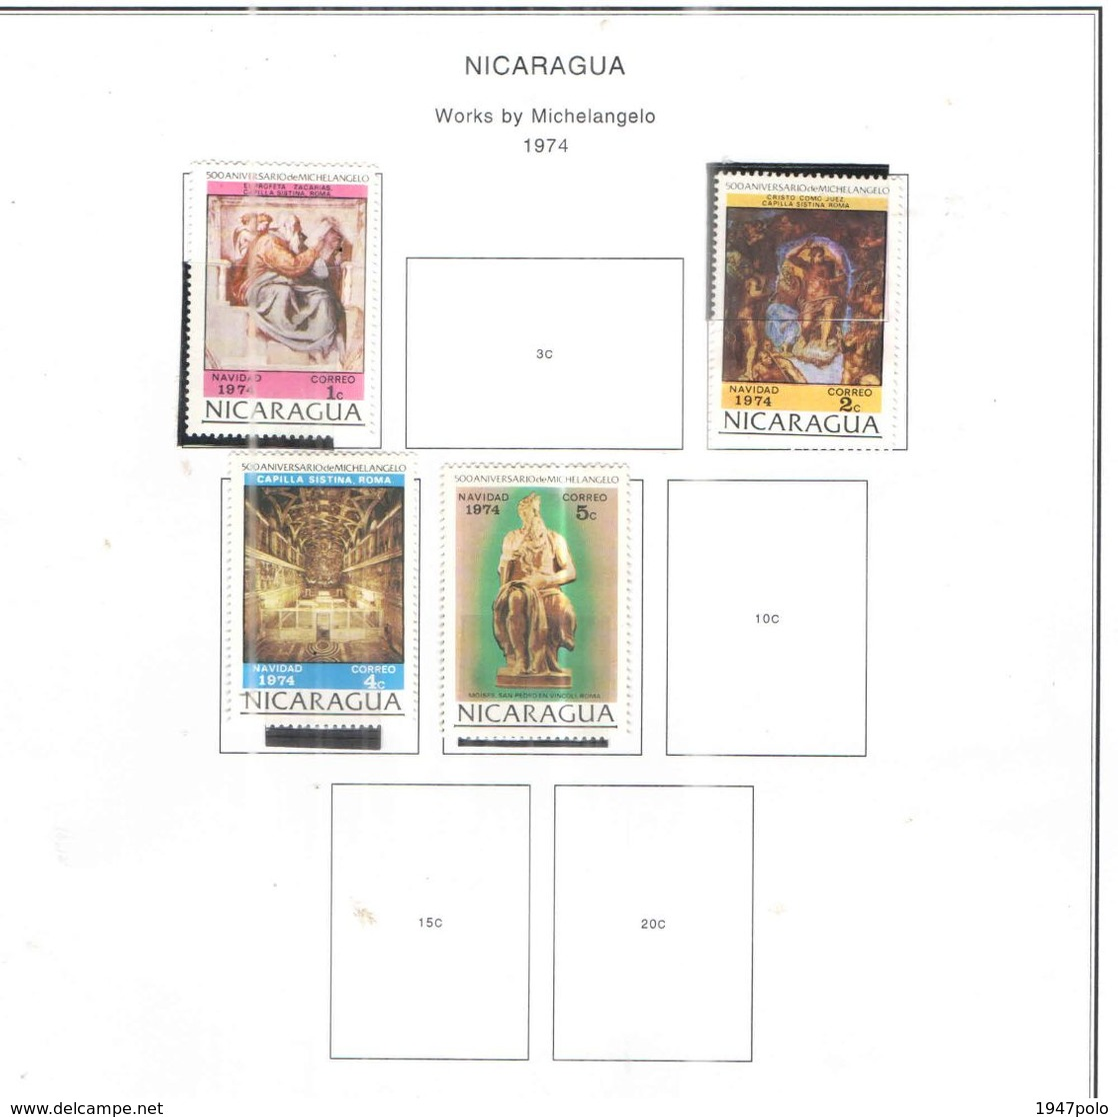 Nicaragua 1974 Opere Michelangelo Scott.954+955+957+958+ Usato/Nuovi On Scott.Album See Scans - Nicaragua